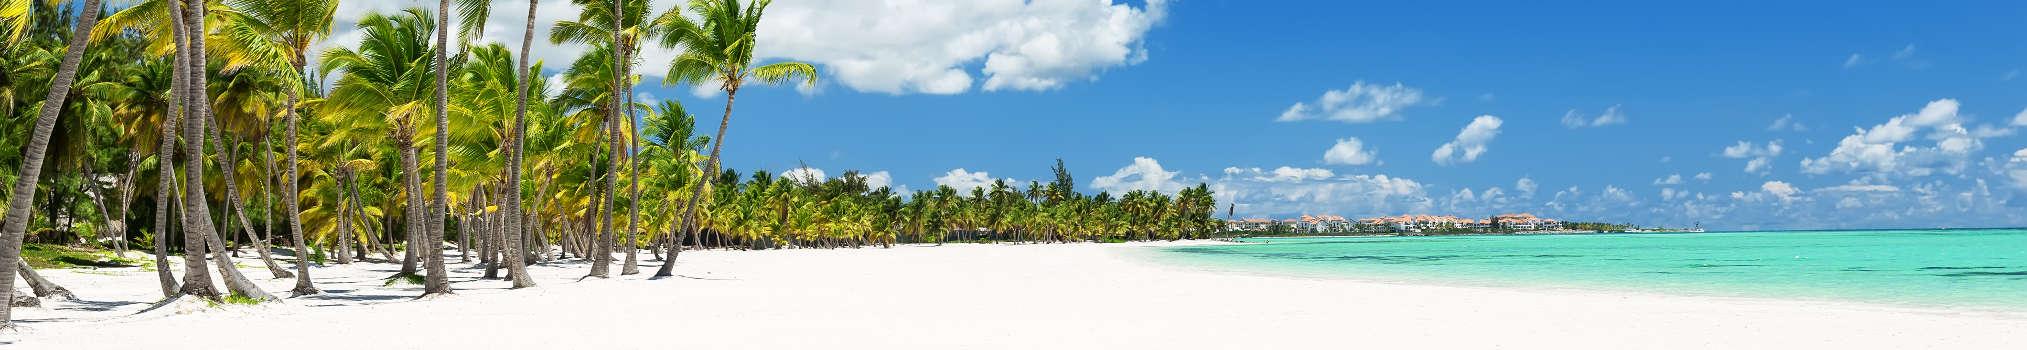 Risultati immagini per caraibi